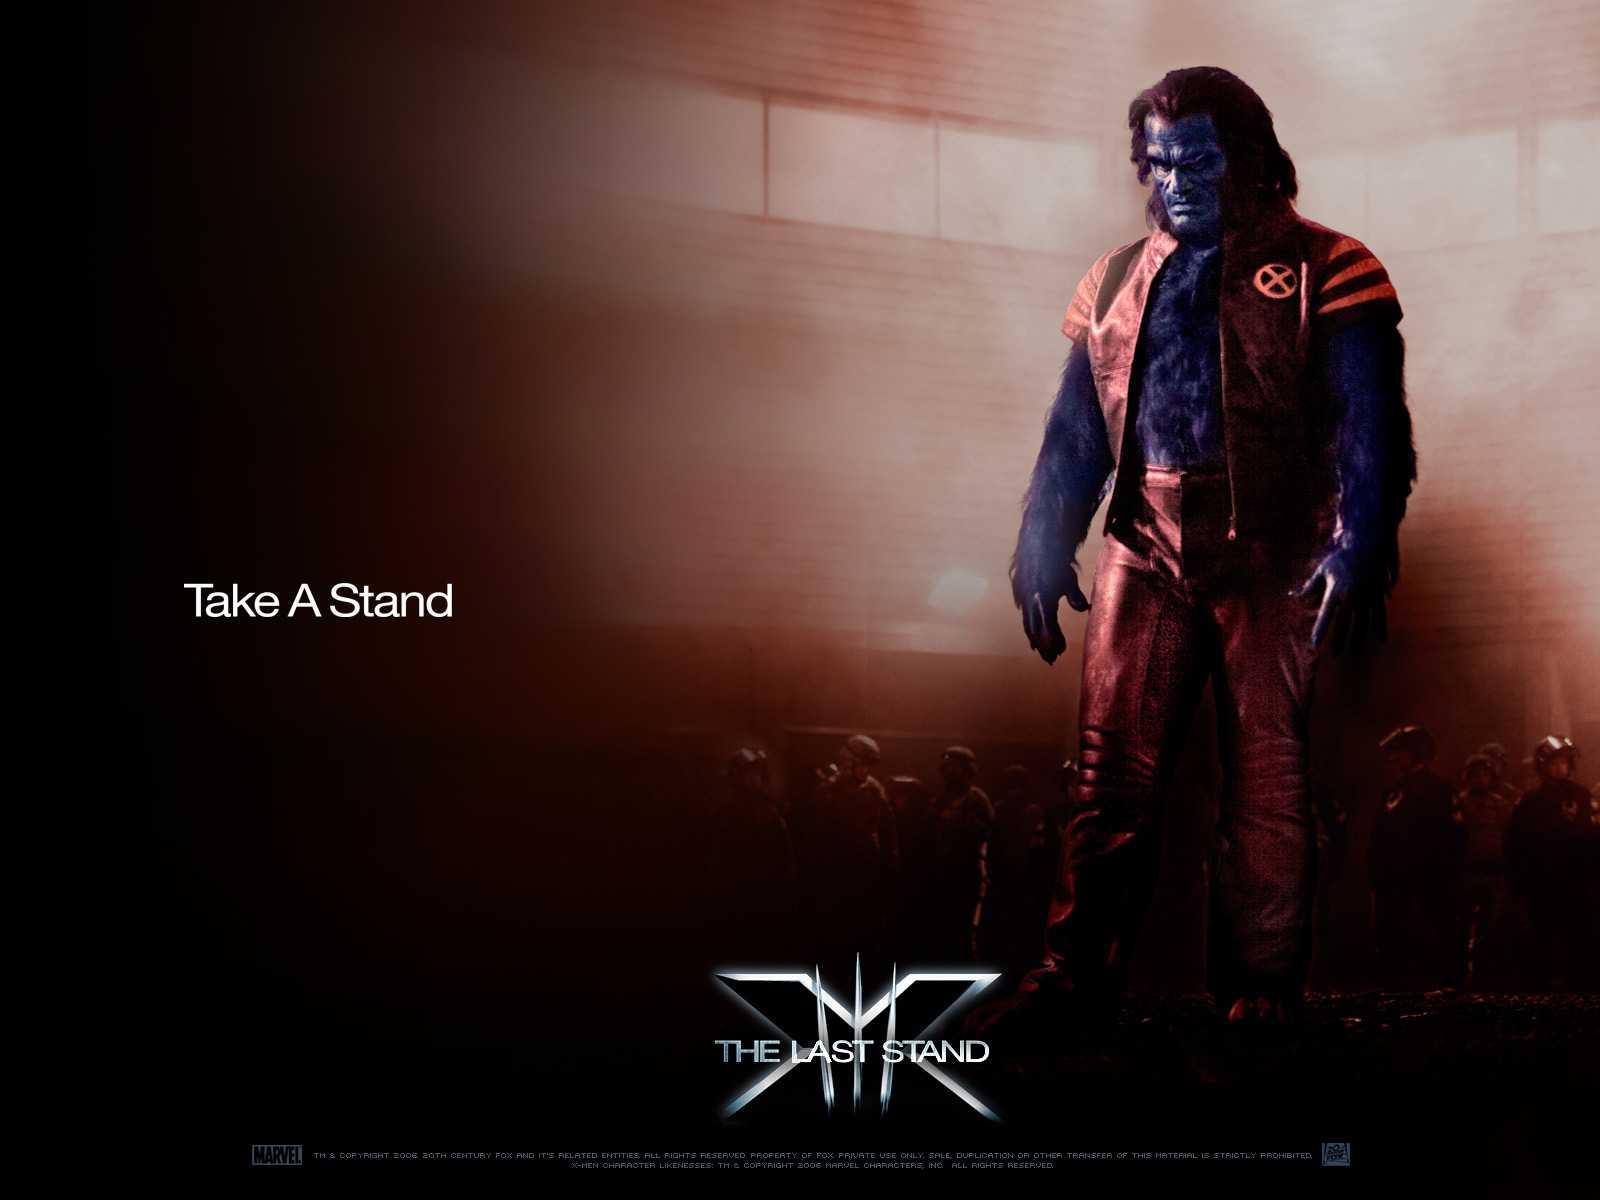 http://2.bp.blogspot.com/--PlY76UpRe4/TxVv8eSdDOI/AAAAAAAADwQ/hJYOeO3omg4/s1600/Free+Download+Games+X-Men+-+The+Last+Stand+Full+Version+%2528System+Requirements%2529+gratis.jpg